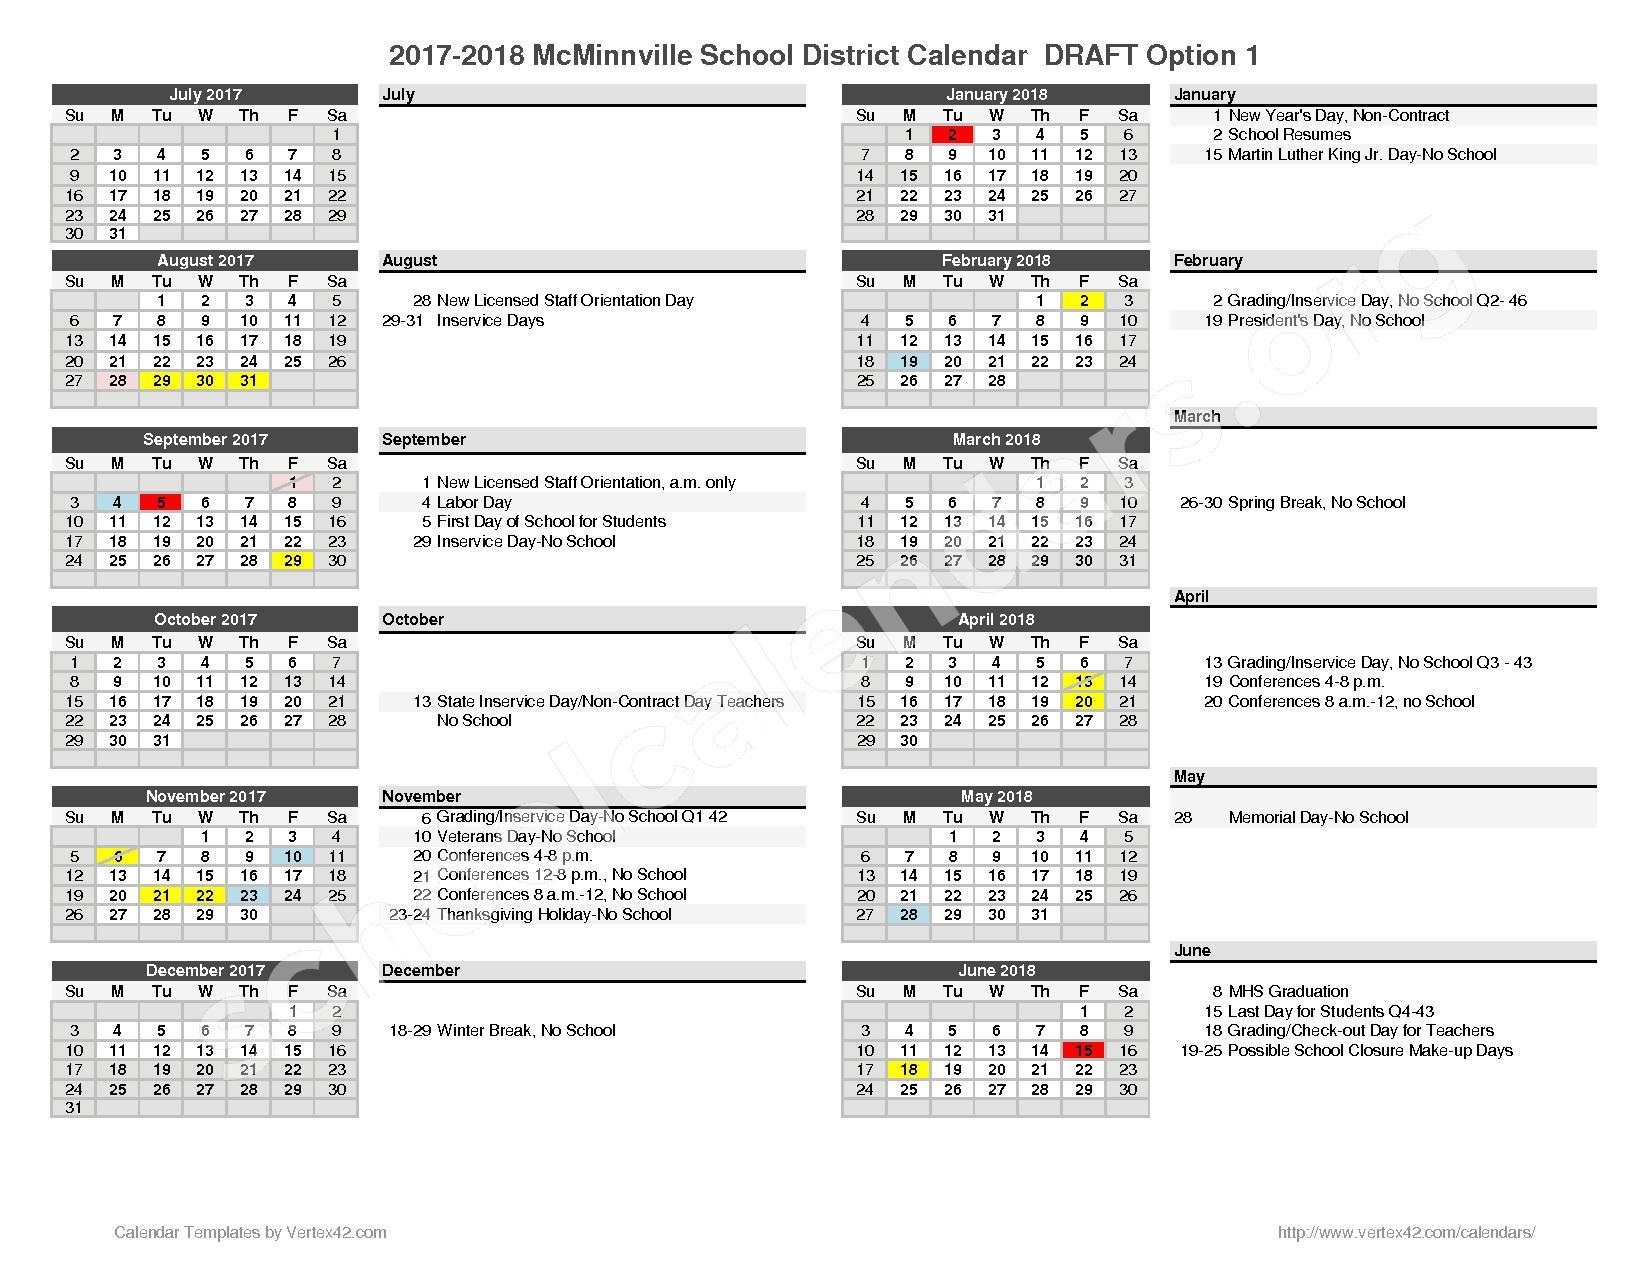 2017 - 2018 School Calendar – McMinnville School District – page 1